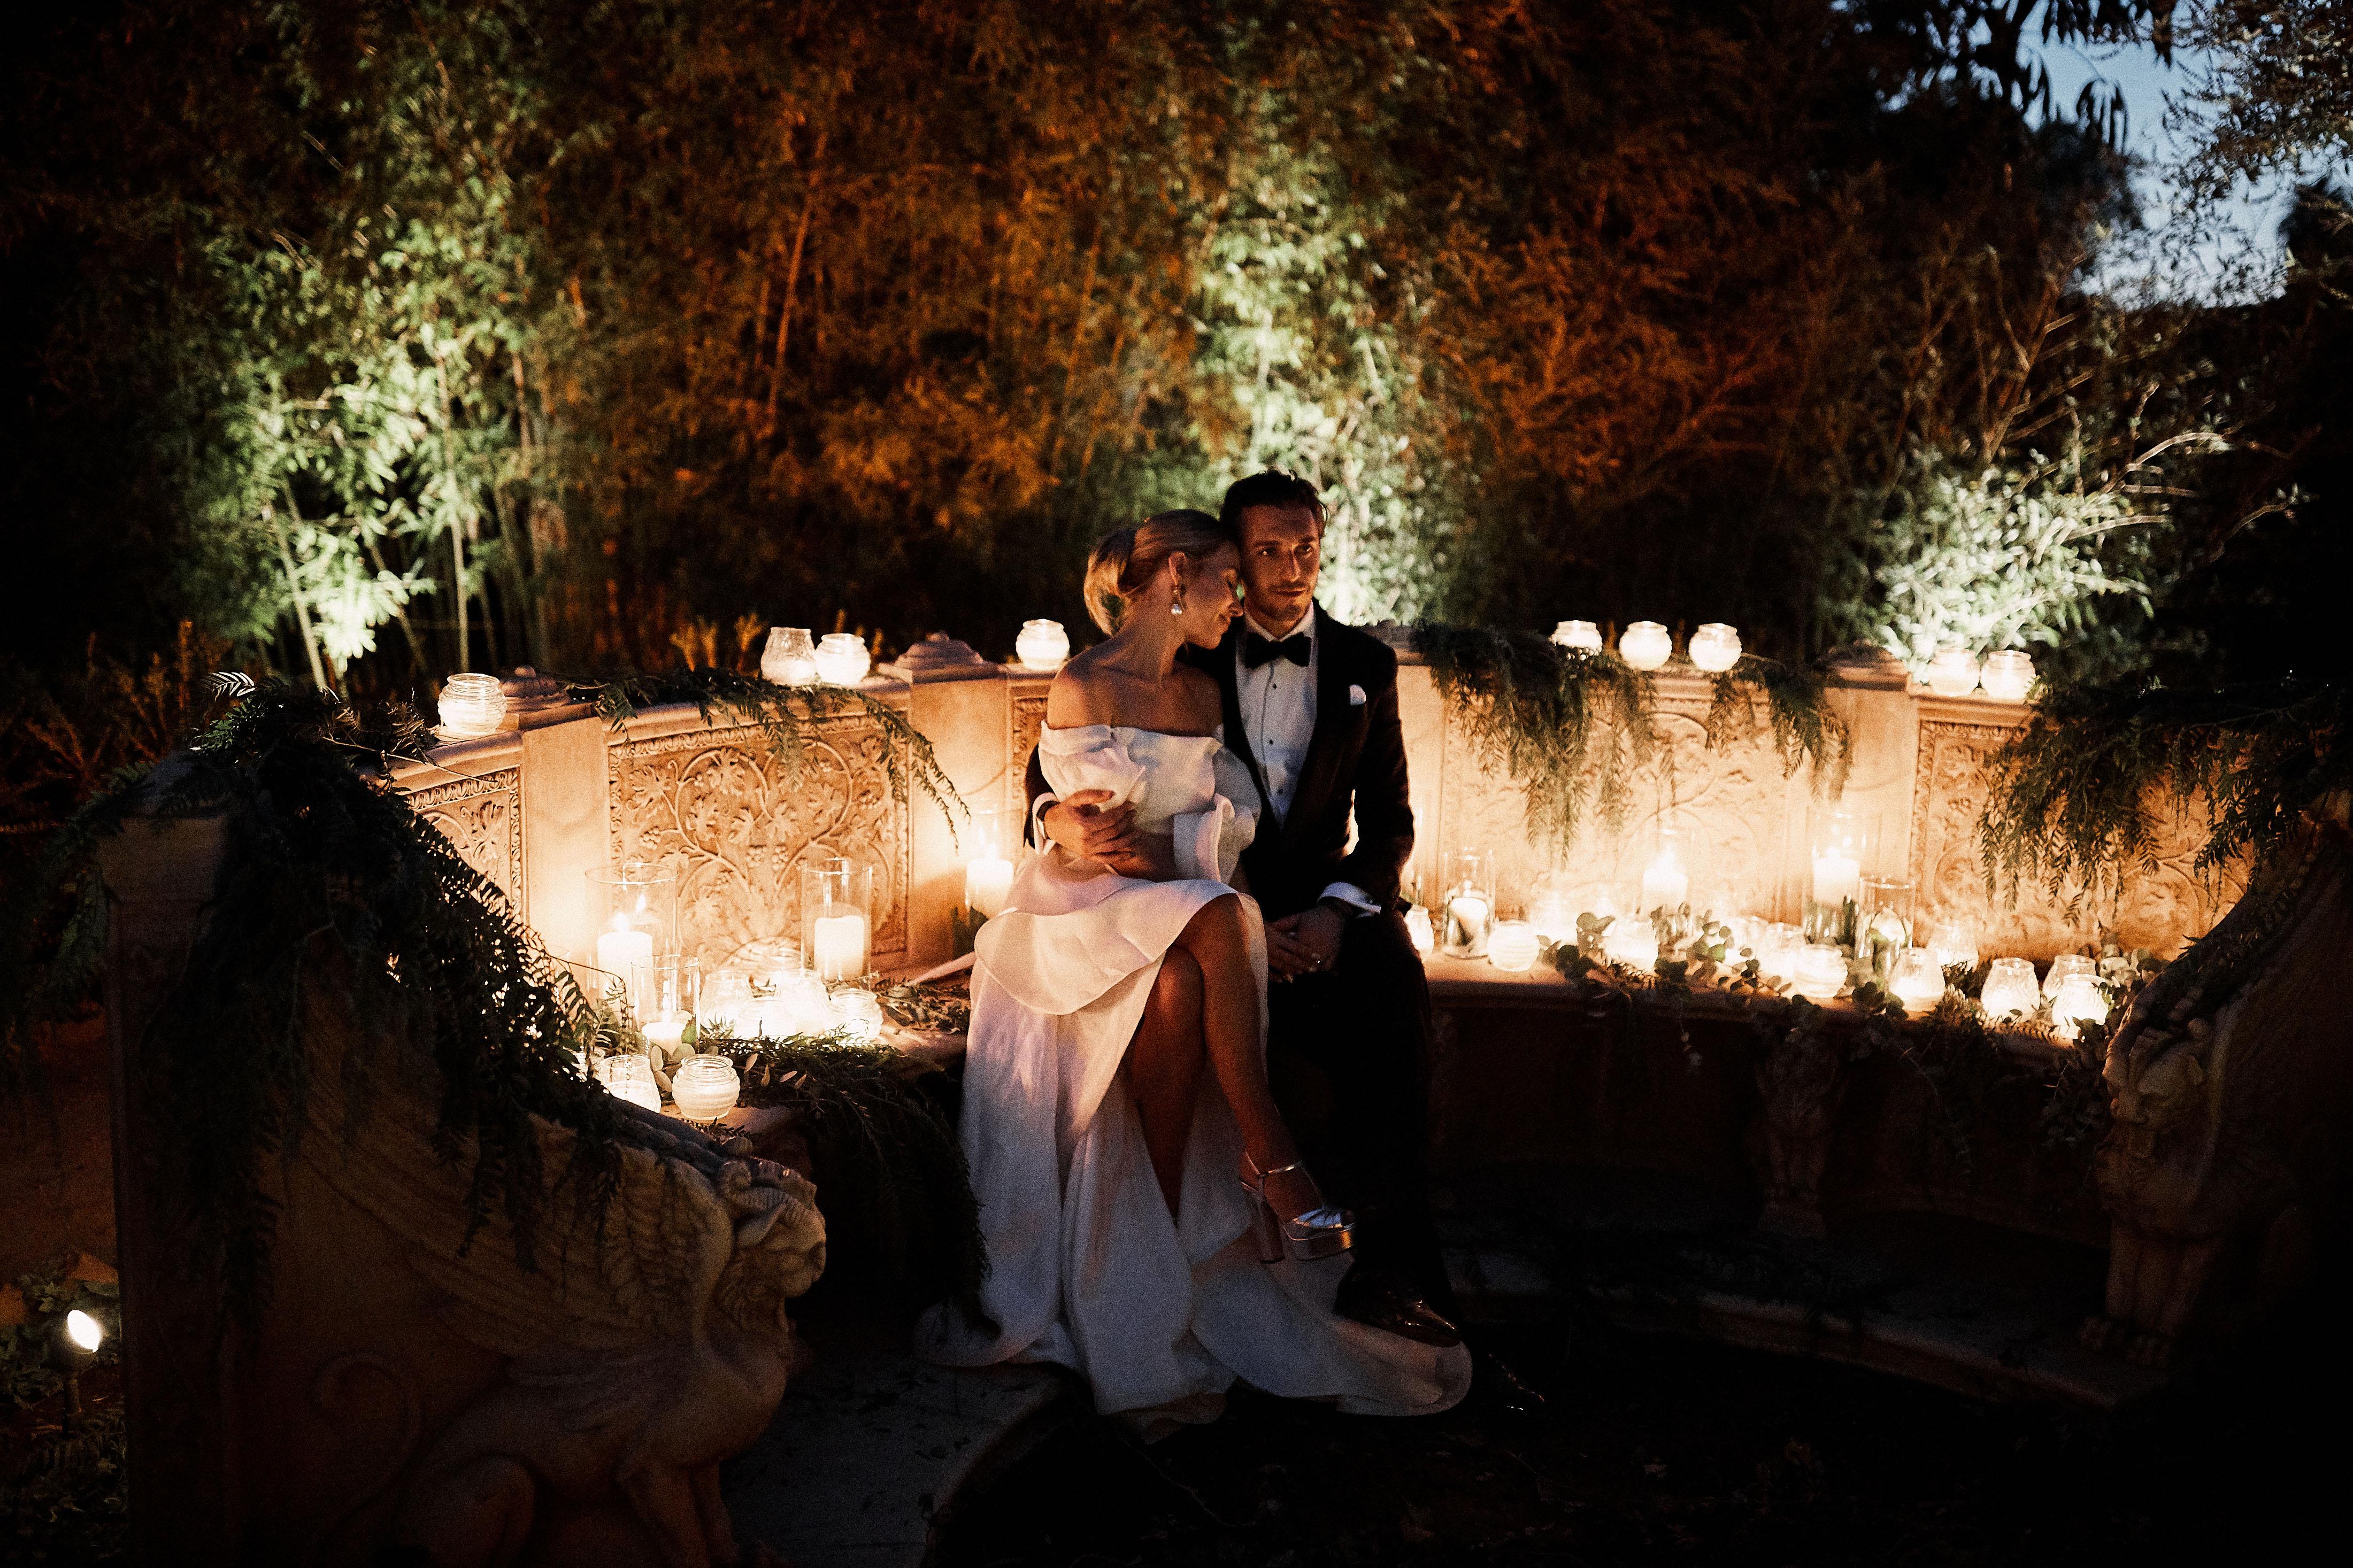 karolina sorab wedding couple hugging surrounded by candles